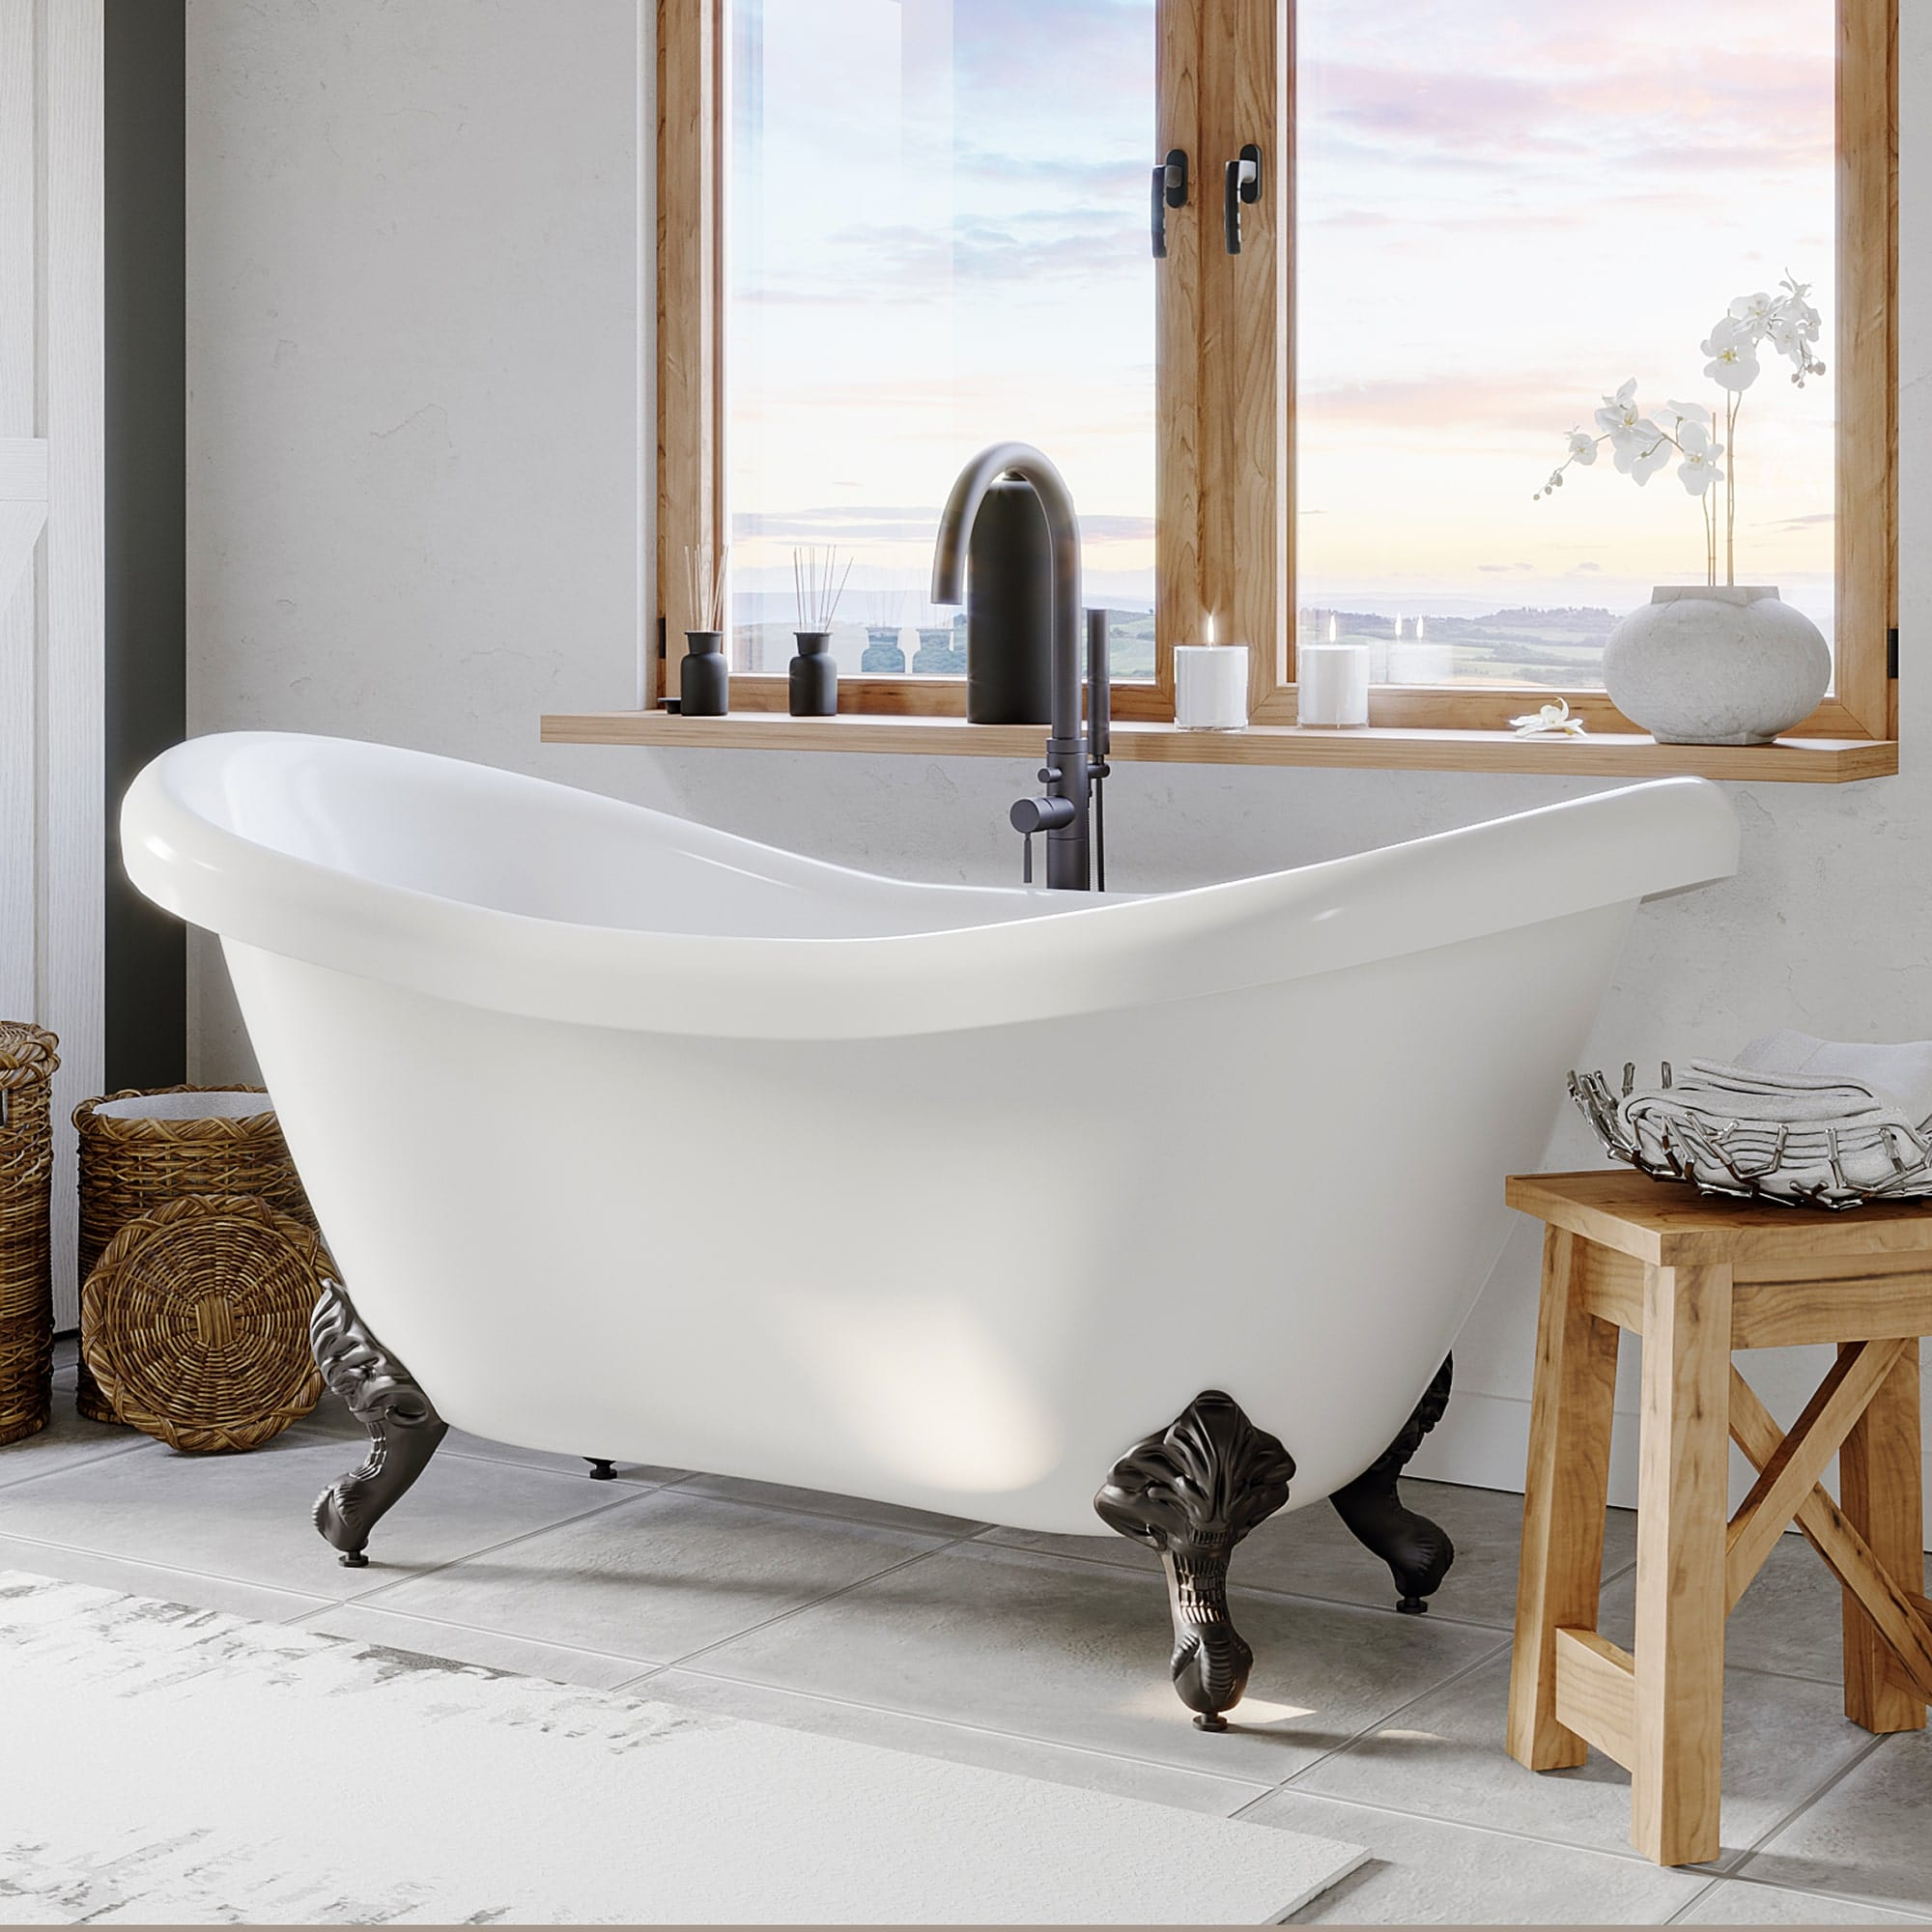 freestanding tub, clawfoot tub, double slipper tub,